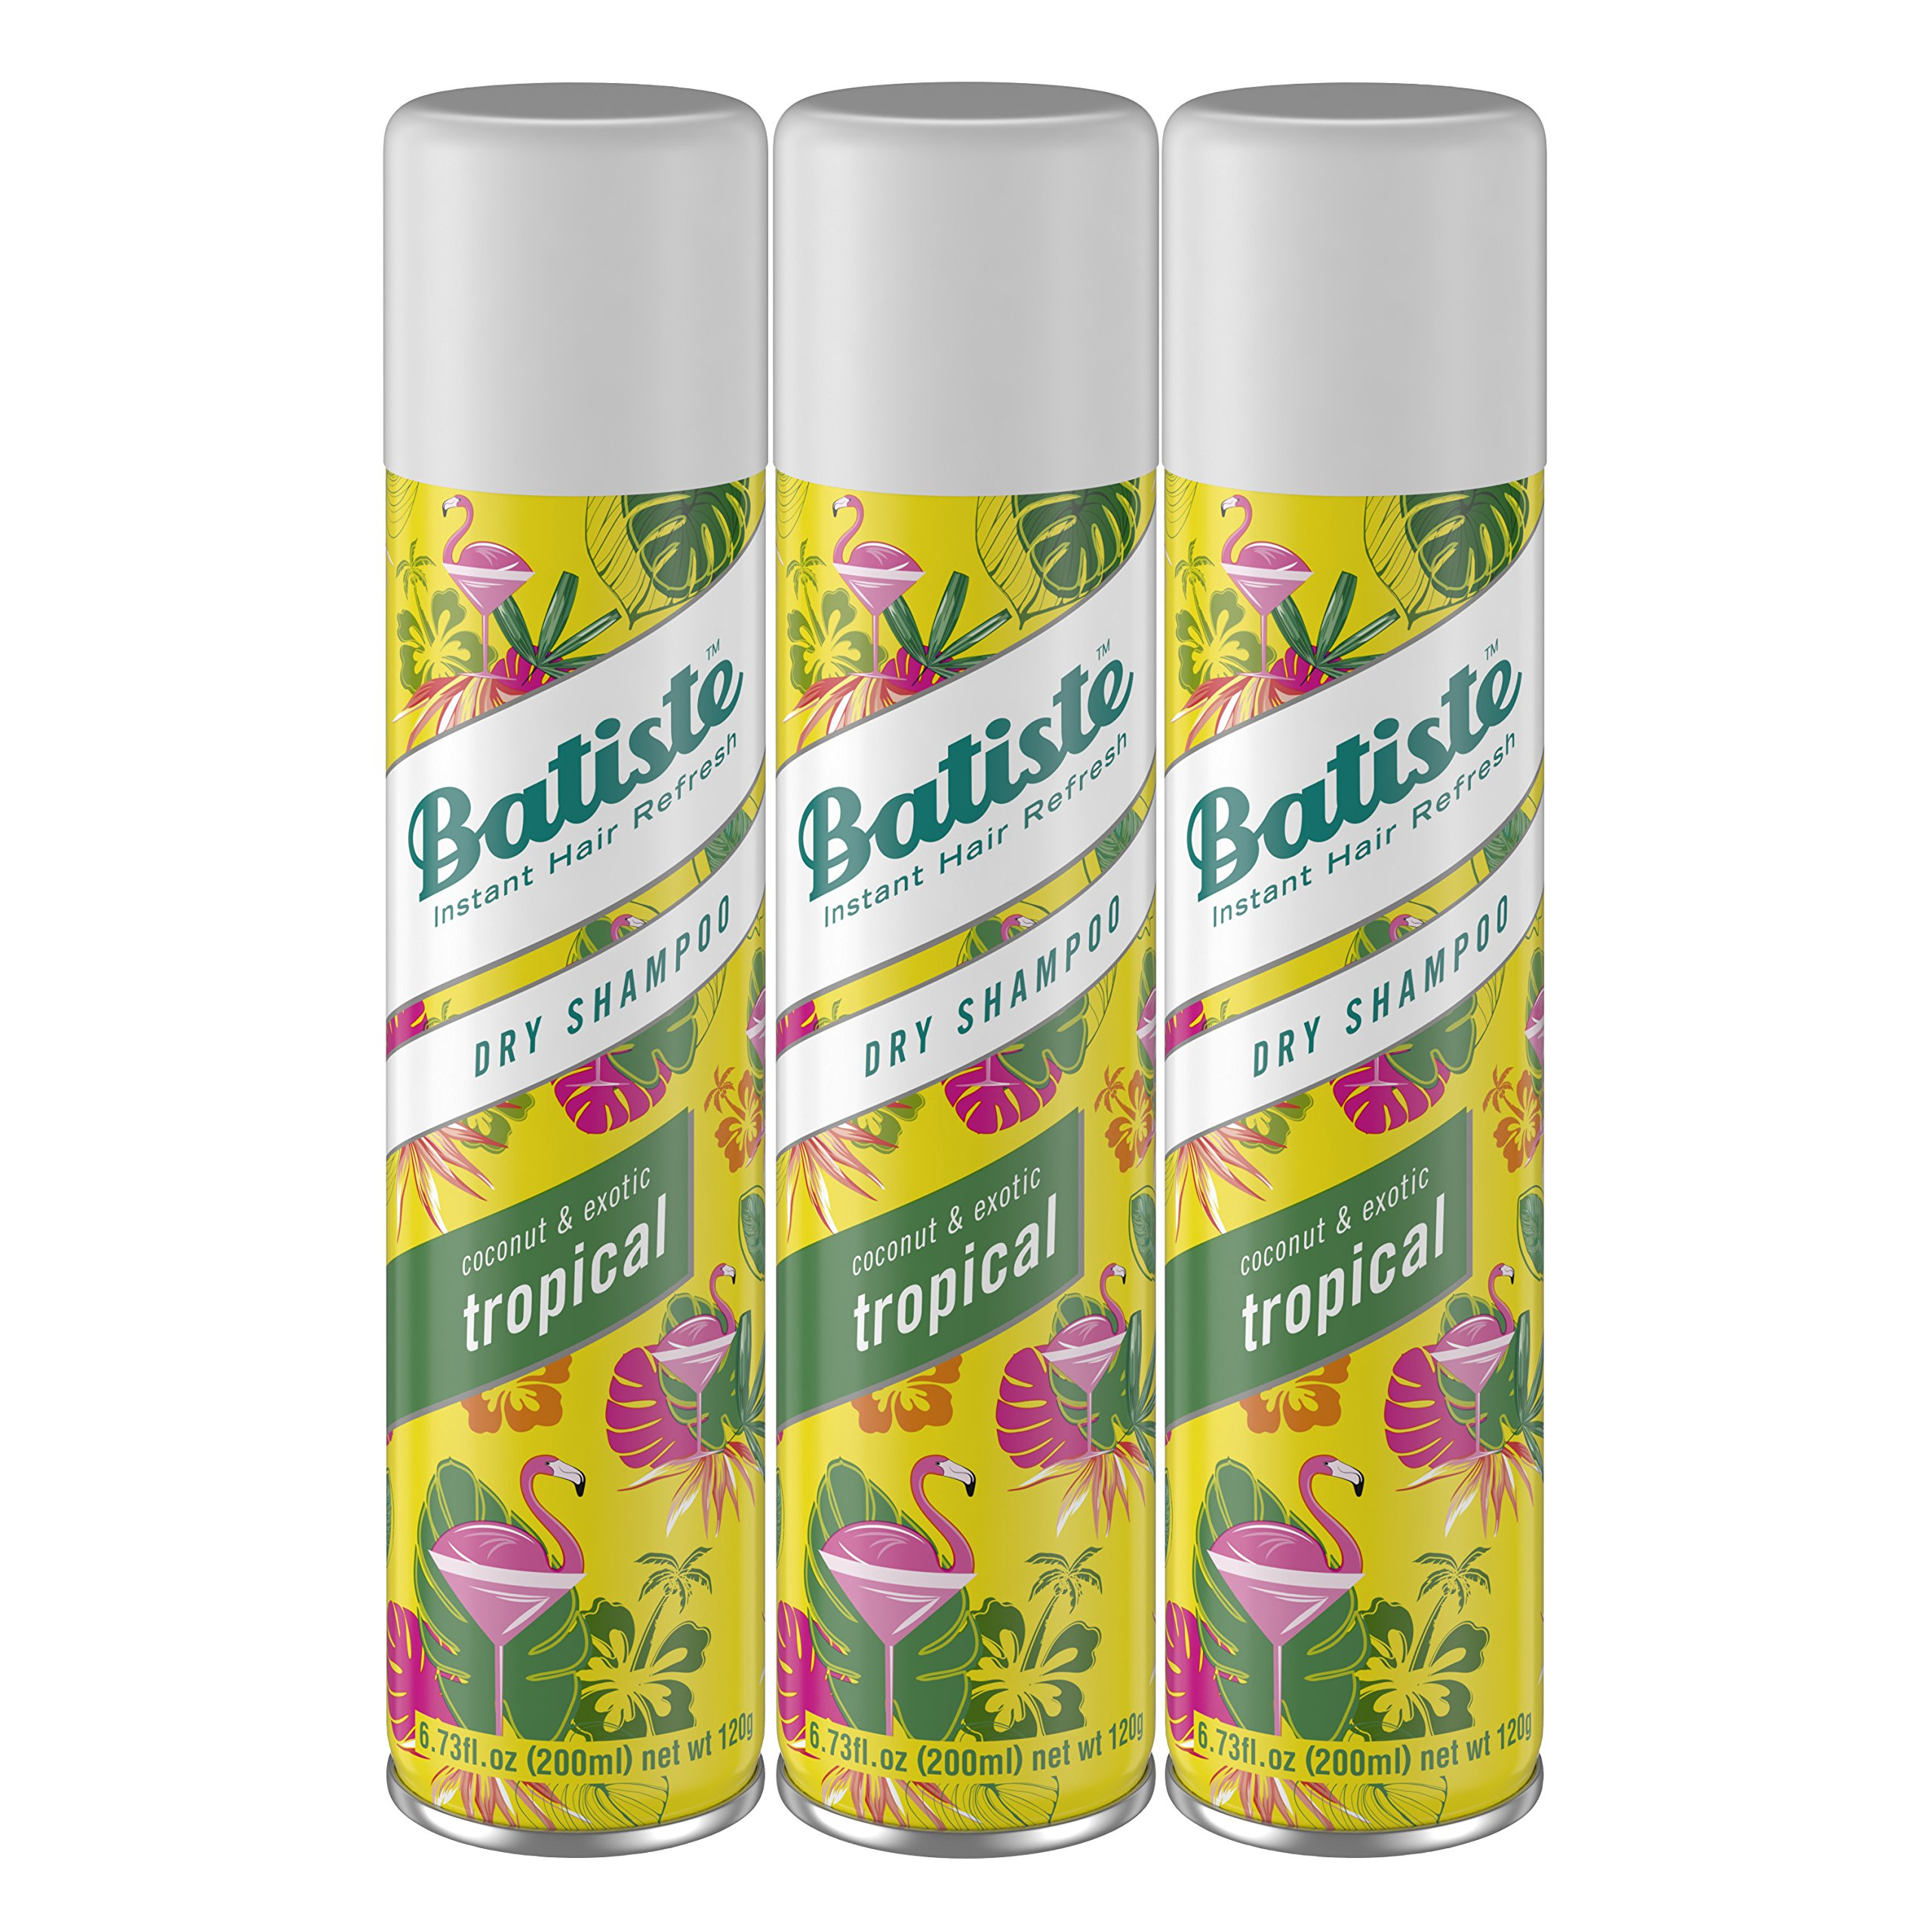 Batiste Dry Shampoo, Tropical Fragrance, 6.73 Fl Oz, Pack of 3 by Batiste